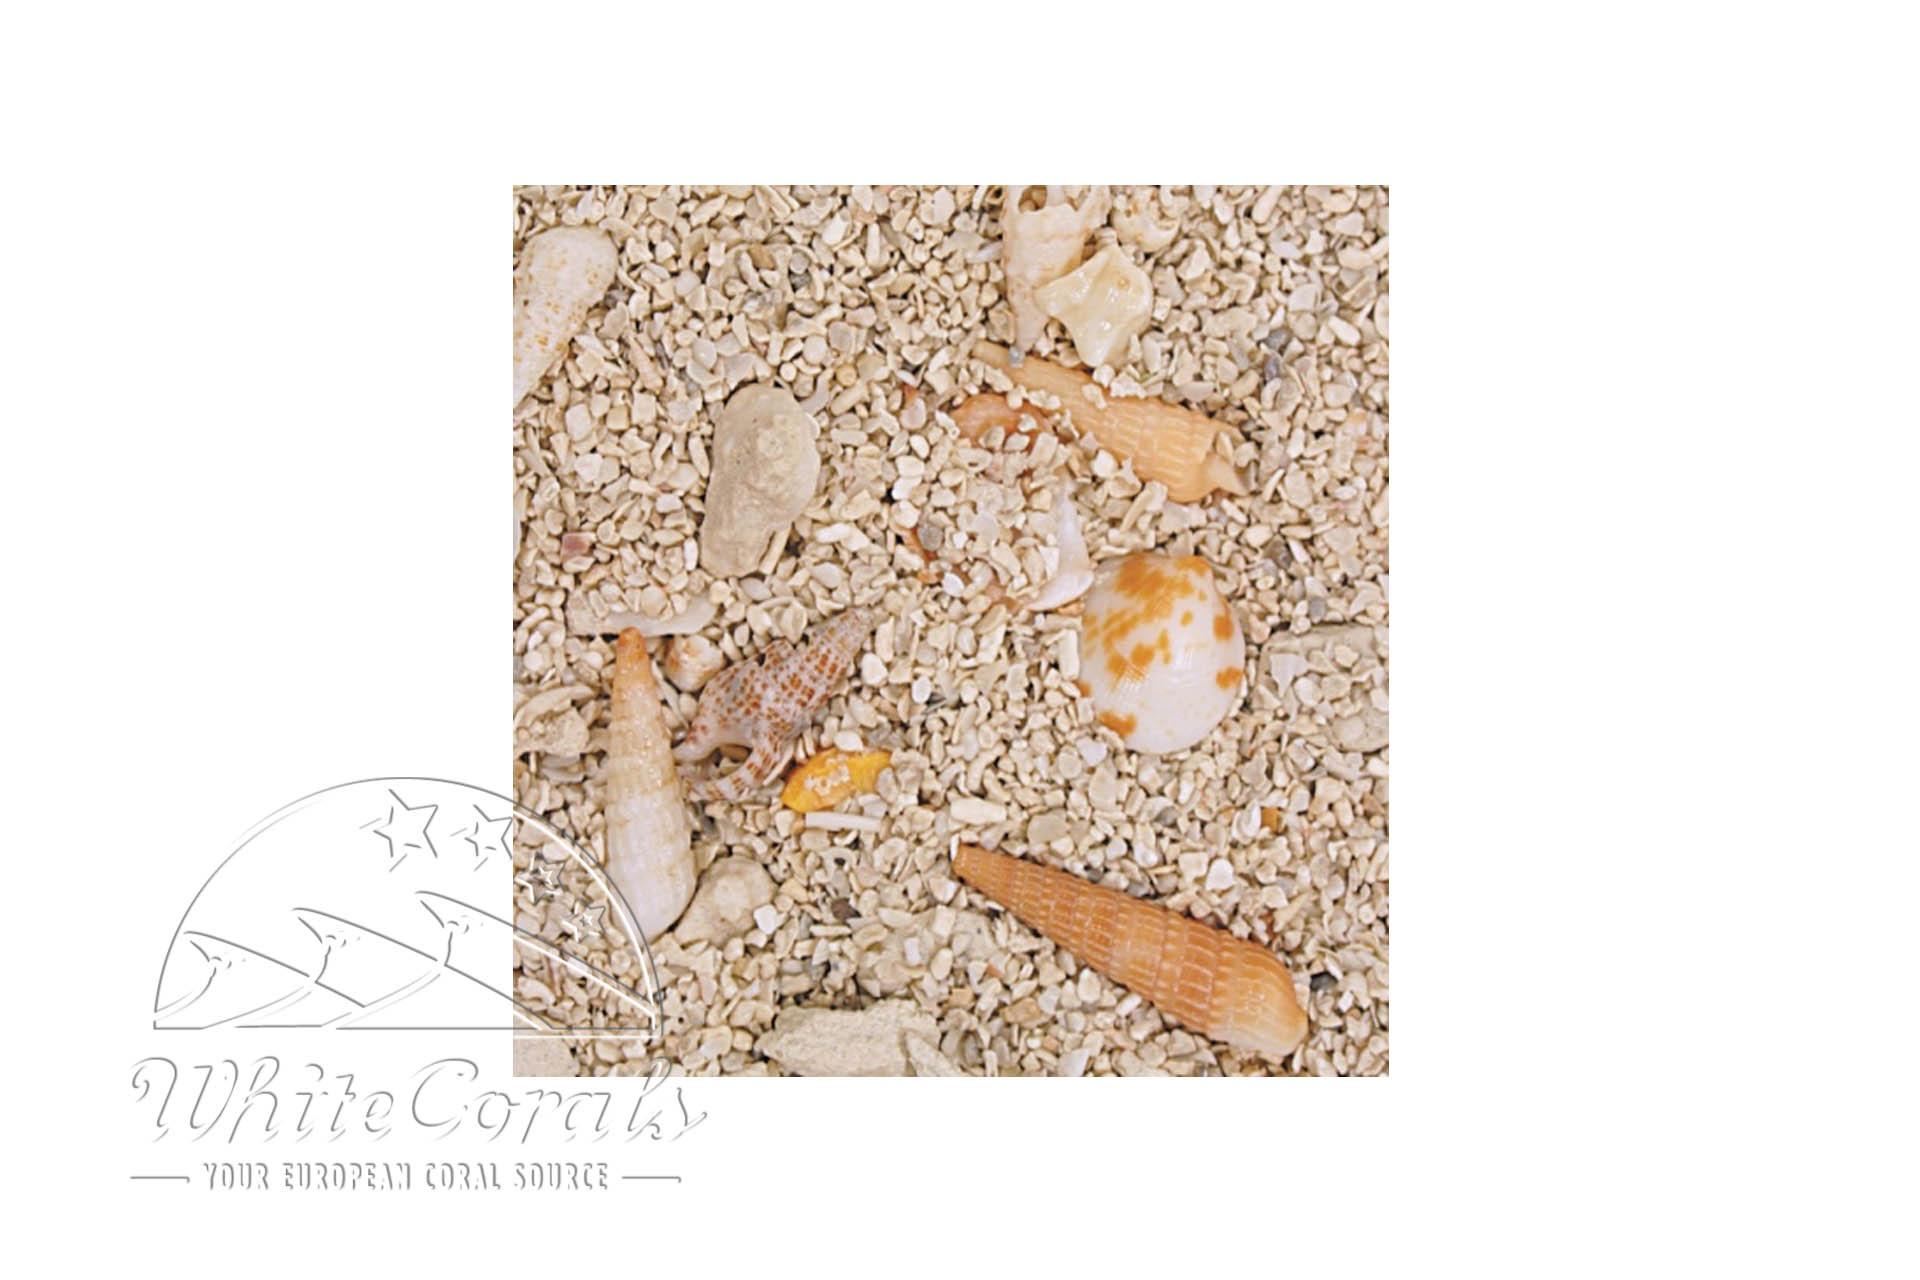 CaribSea Seaflor Super Reef 18,14 kg Sand